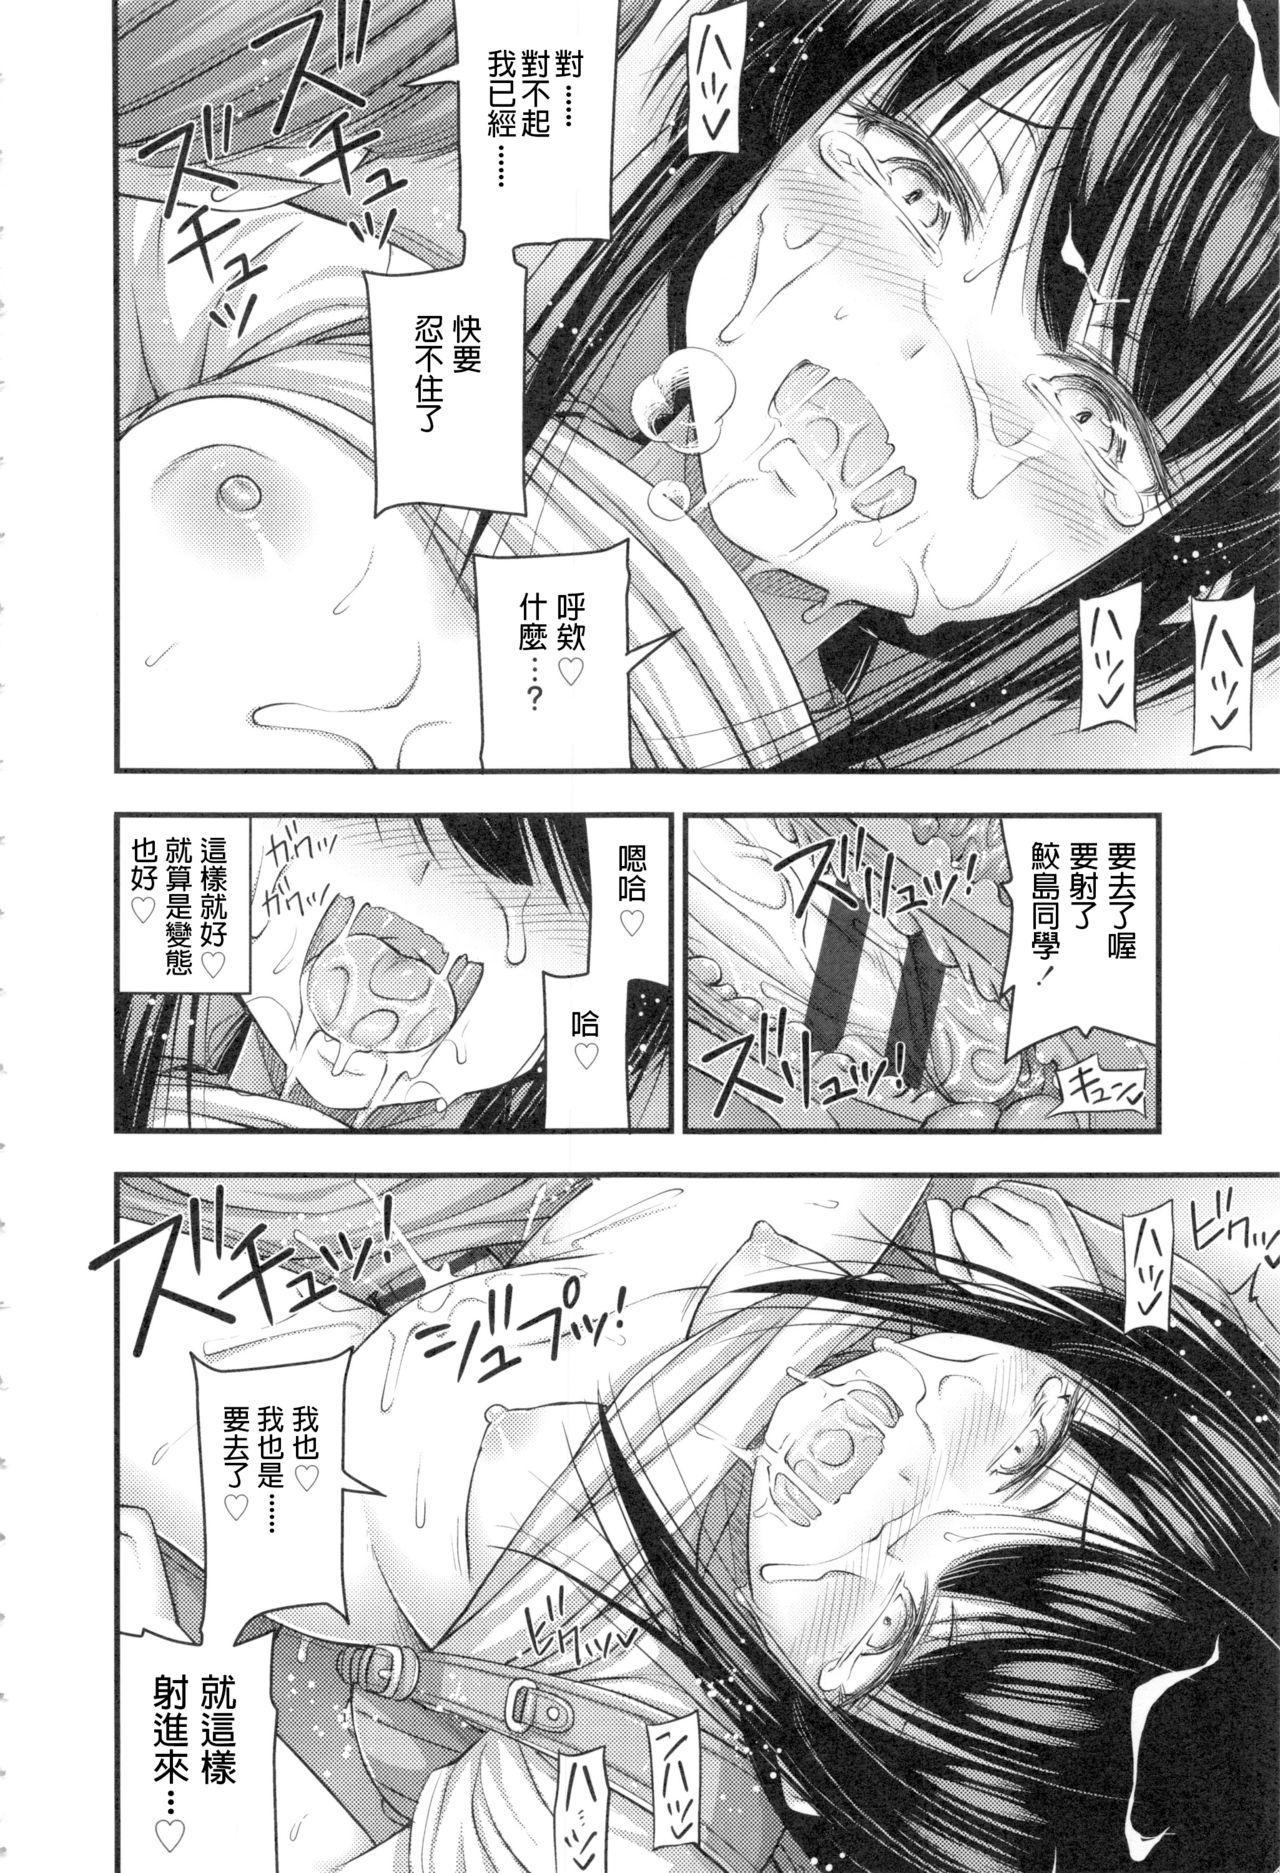 Onii-chan Sonna ni Short Pants Suki nano? 79